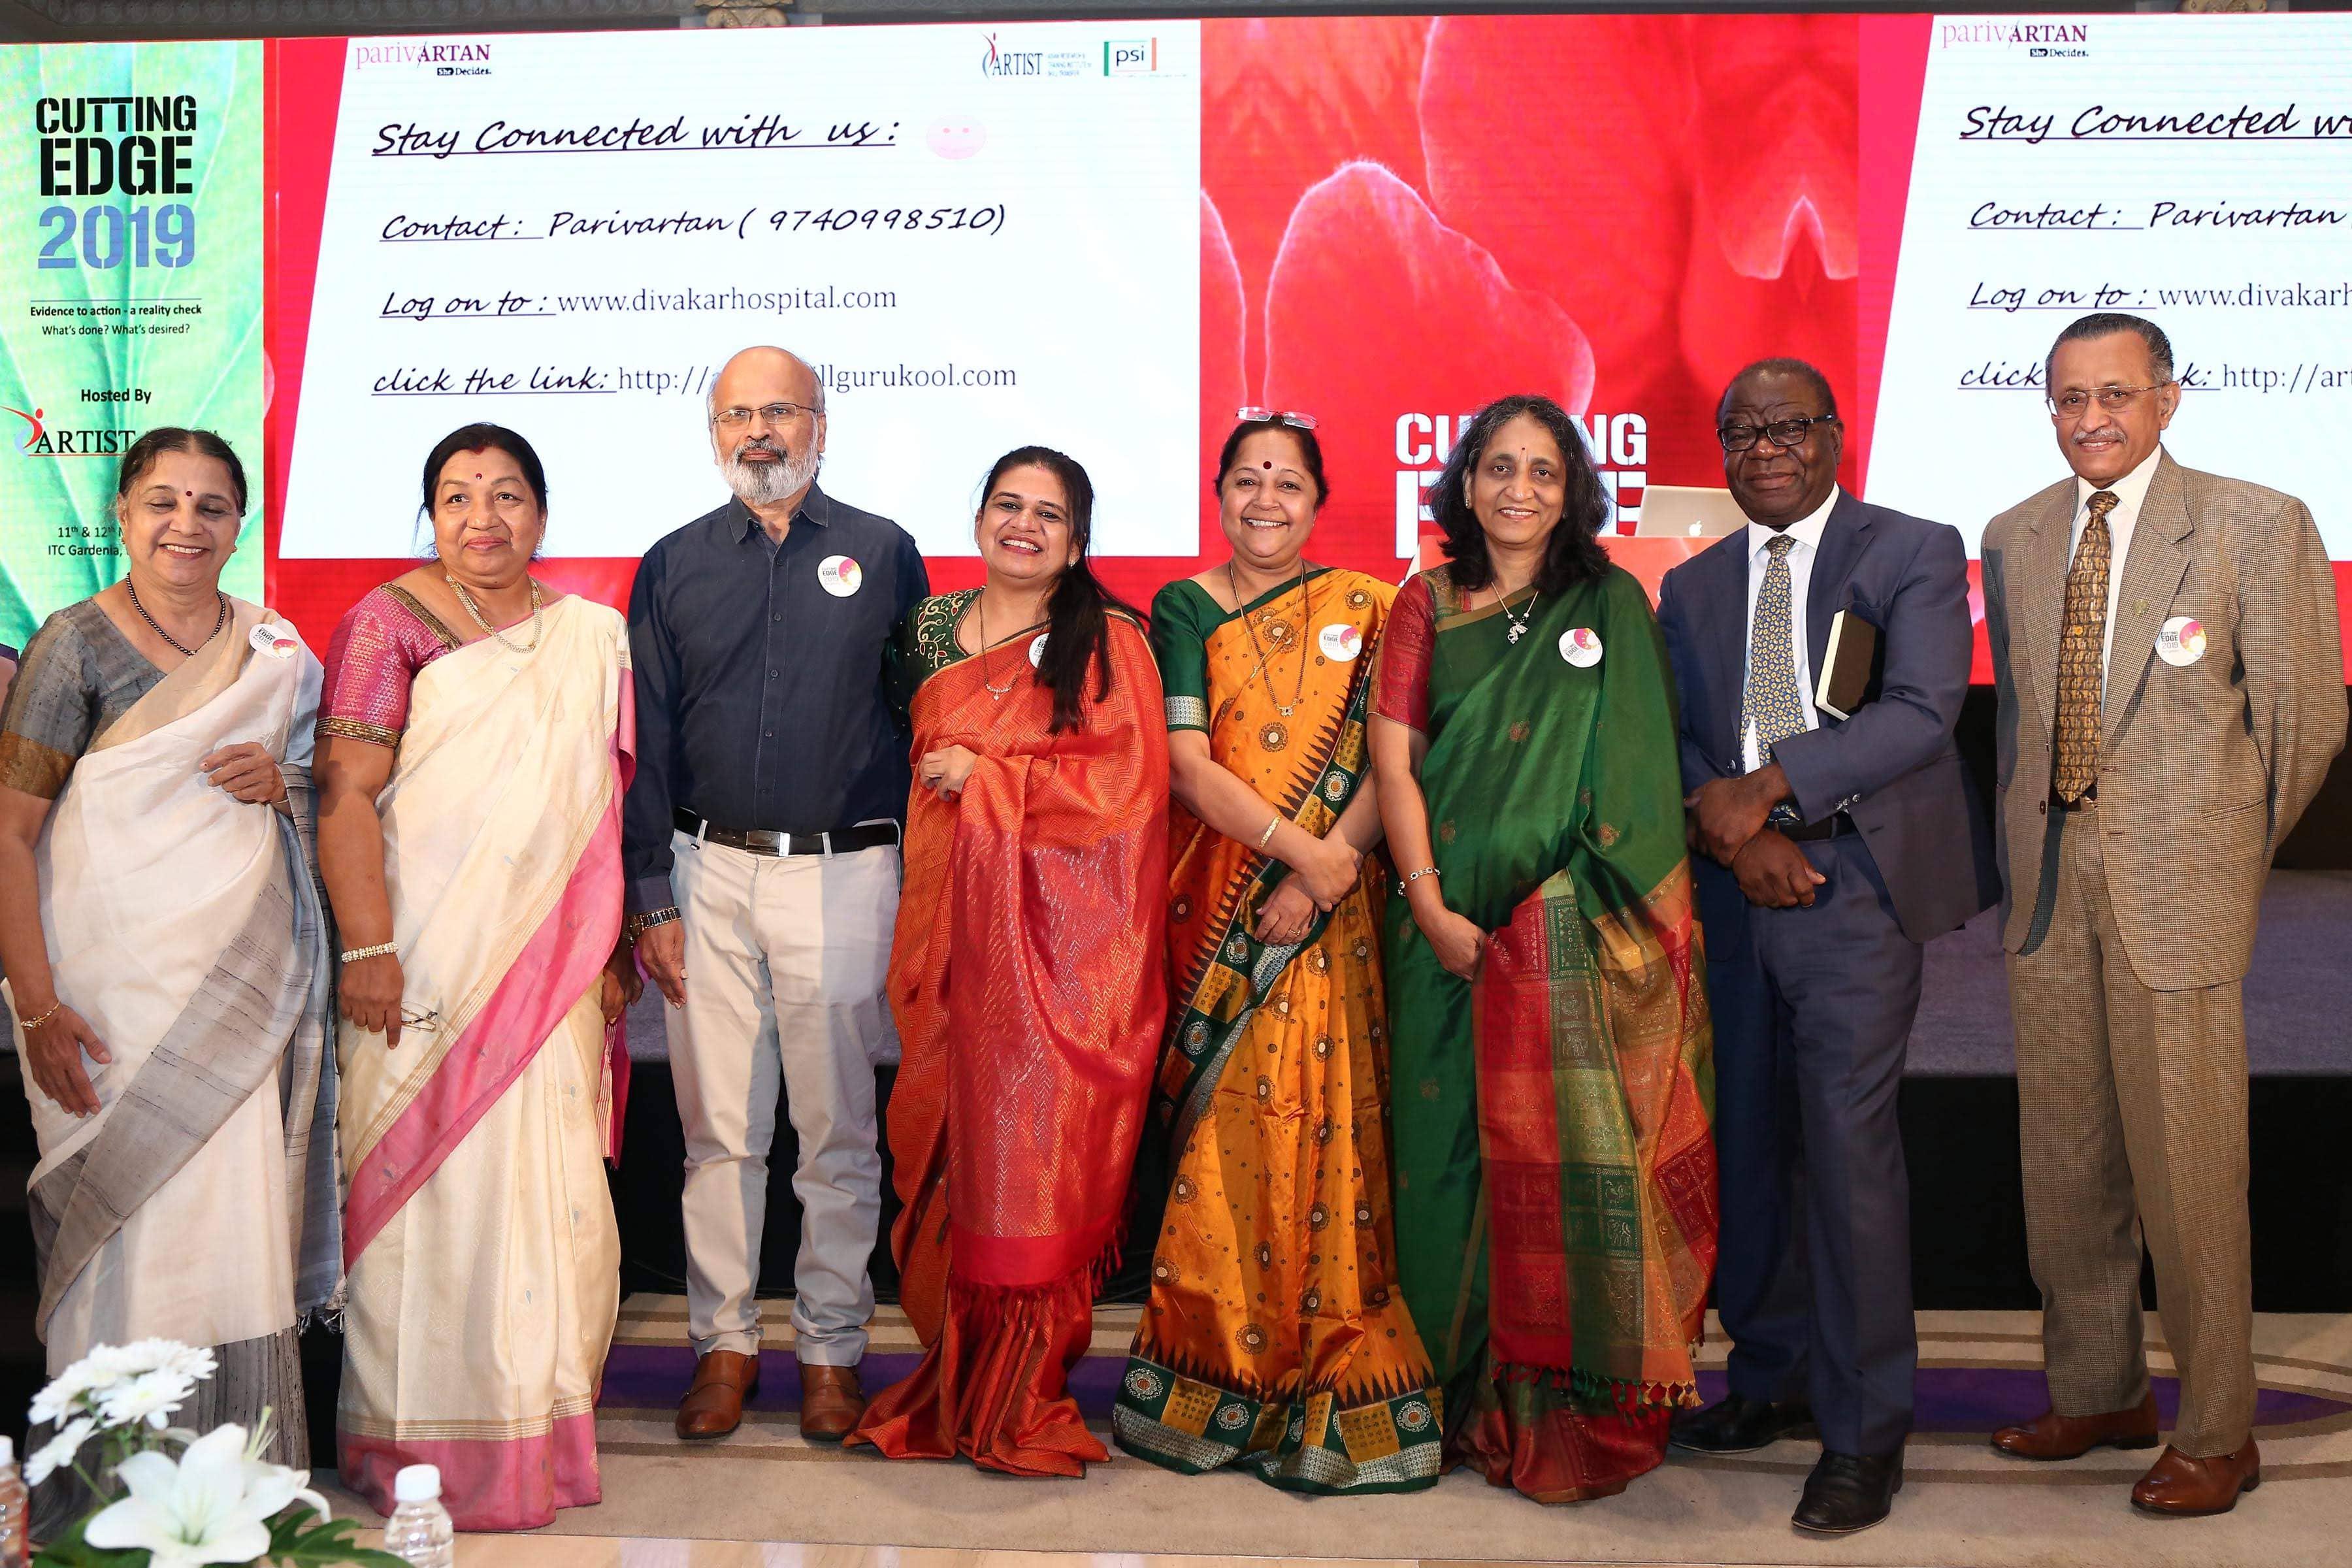 Cutting Edge 2019 Bengaluru - Day 2 12.05.19 @ ITC Gardenia